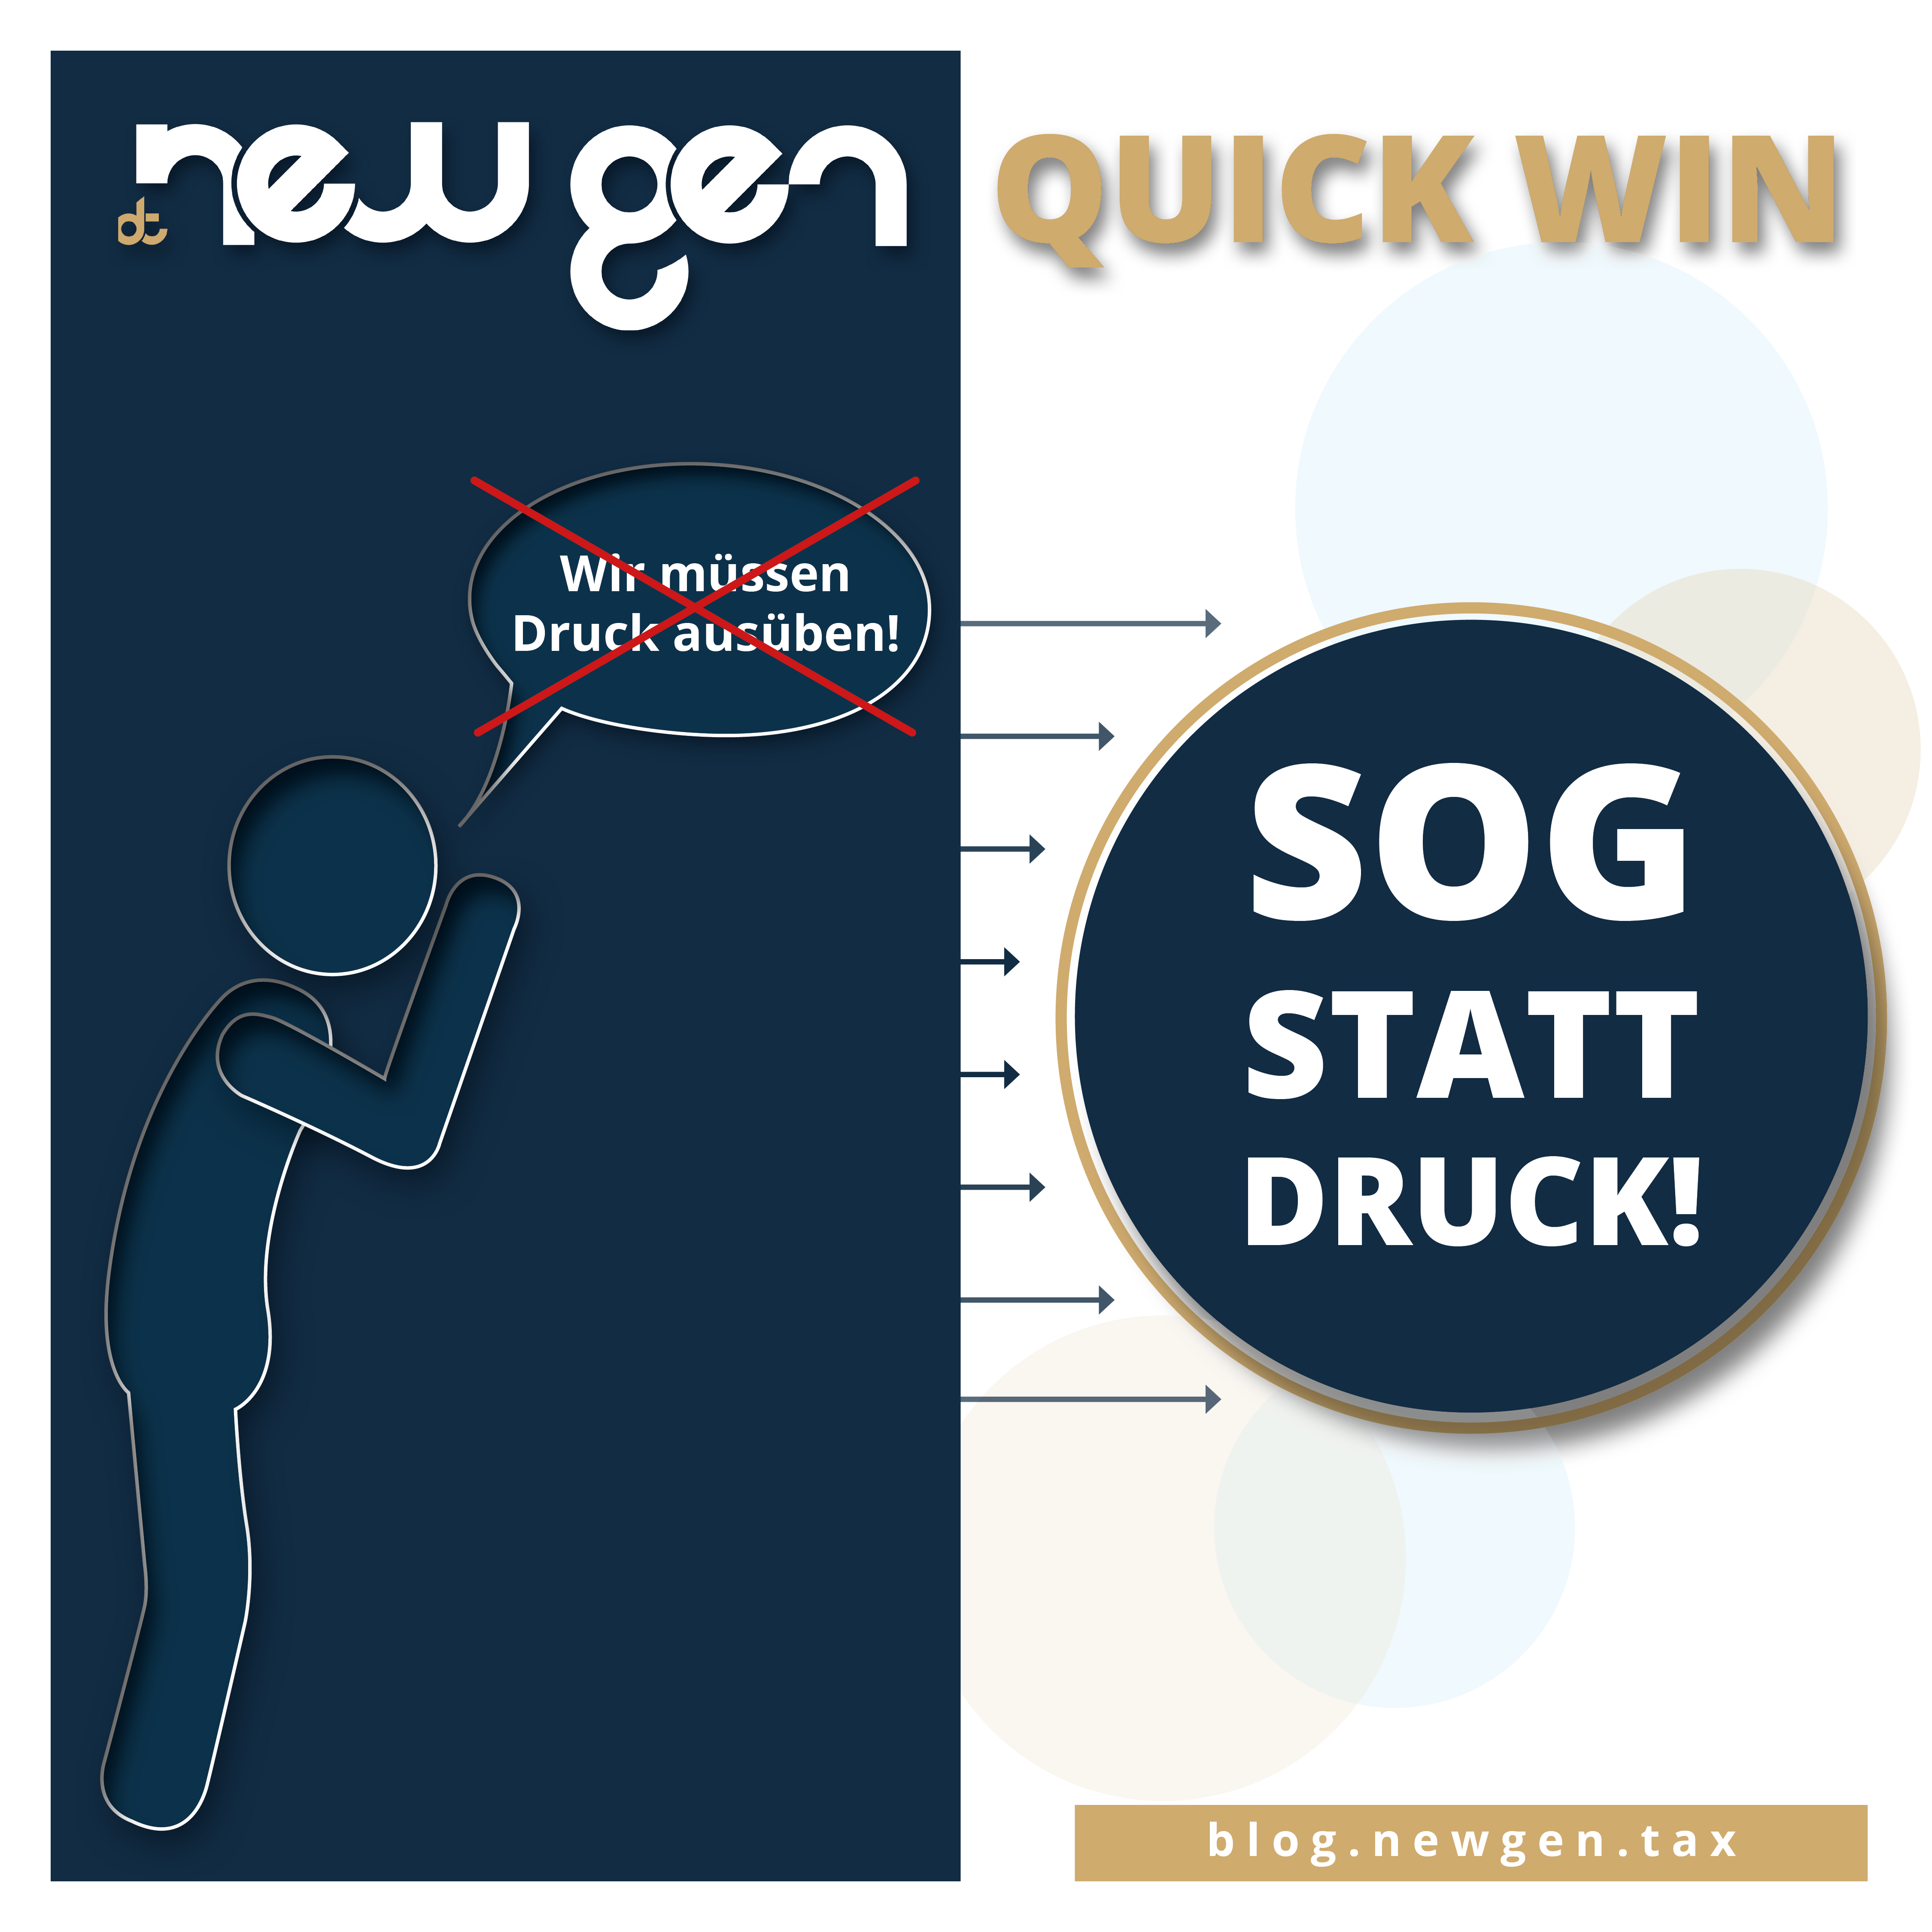 new gen Quick Win - Sog statt Druck